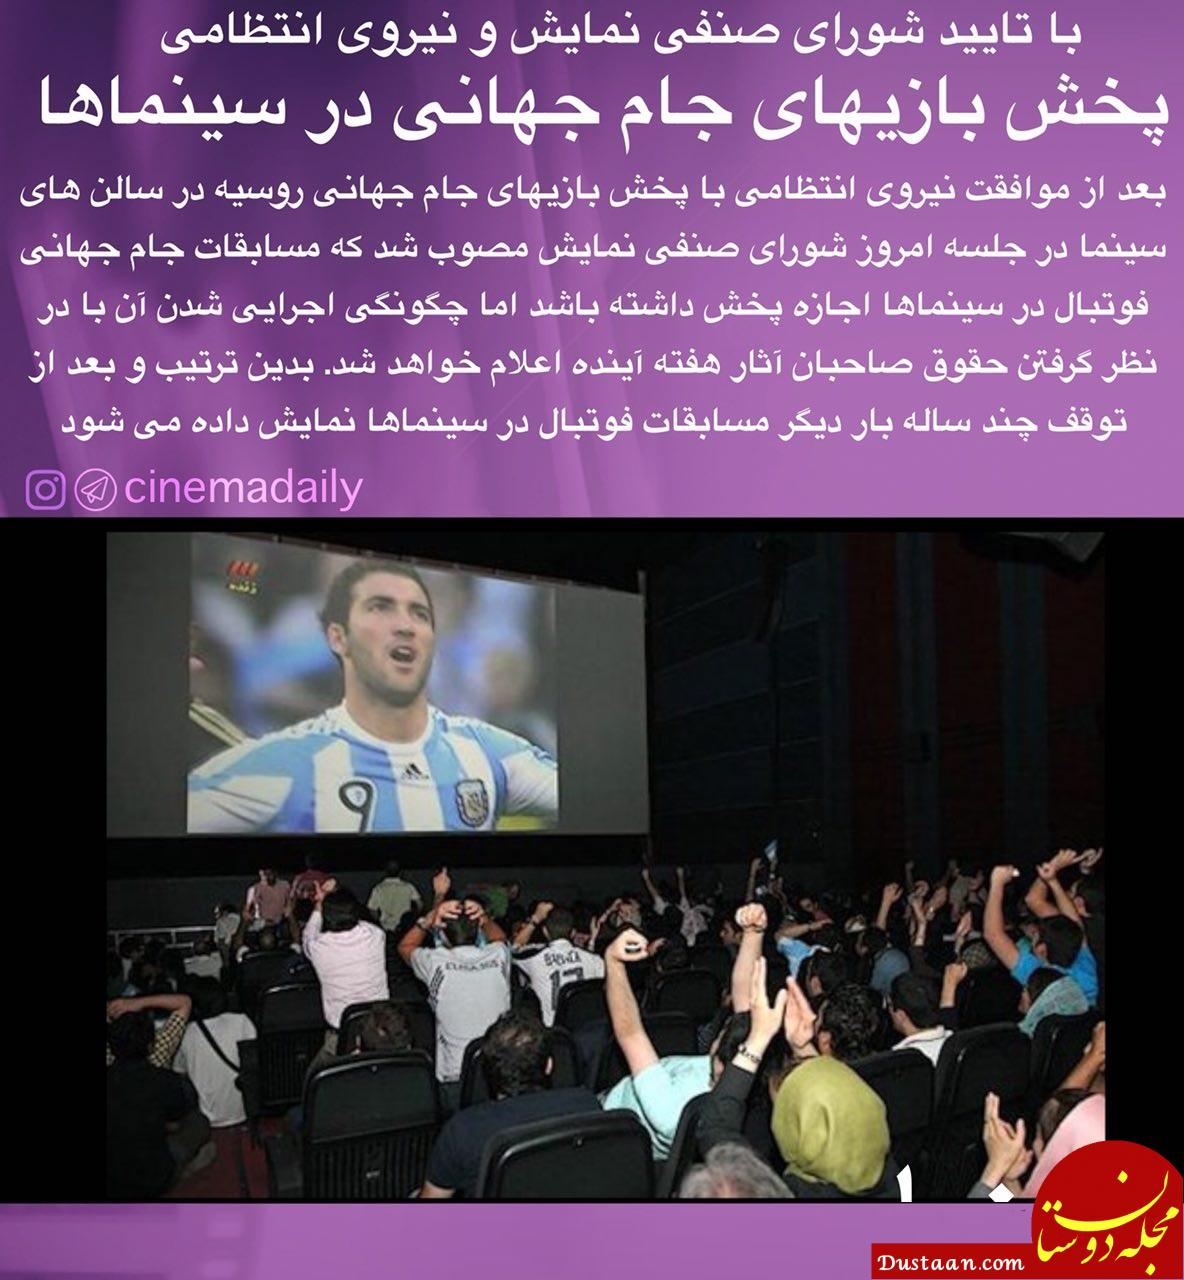 www.dustaan.com پخش بازی های جام جهانی در سینماها قطعی شد